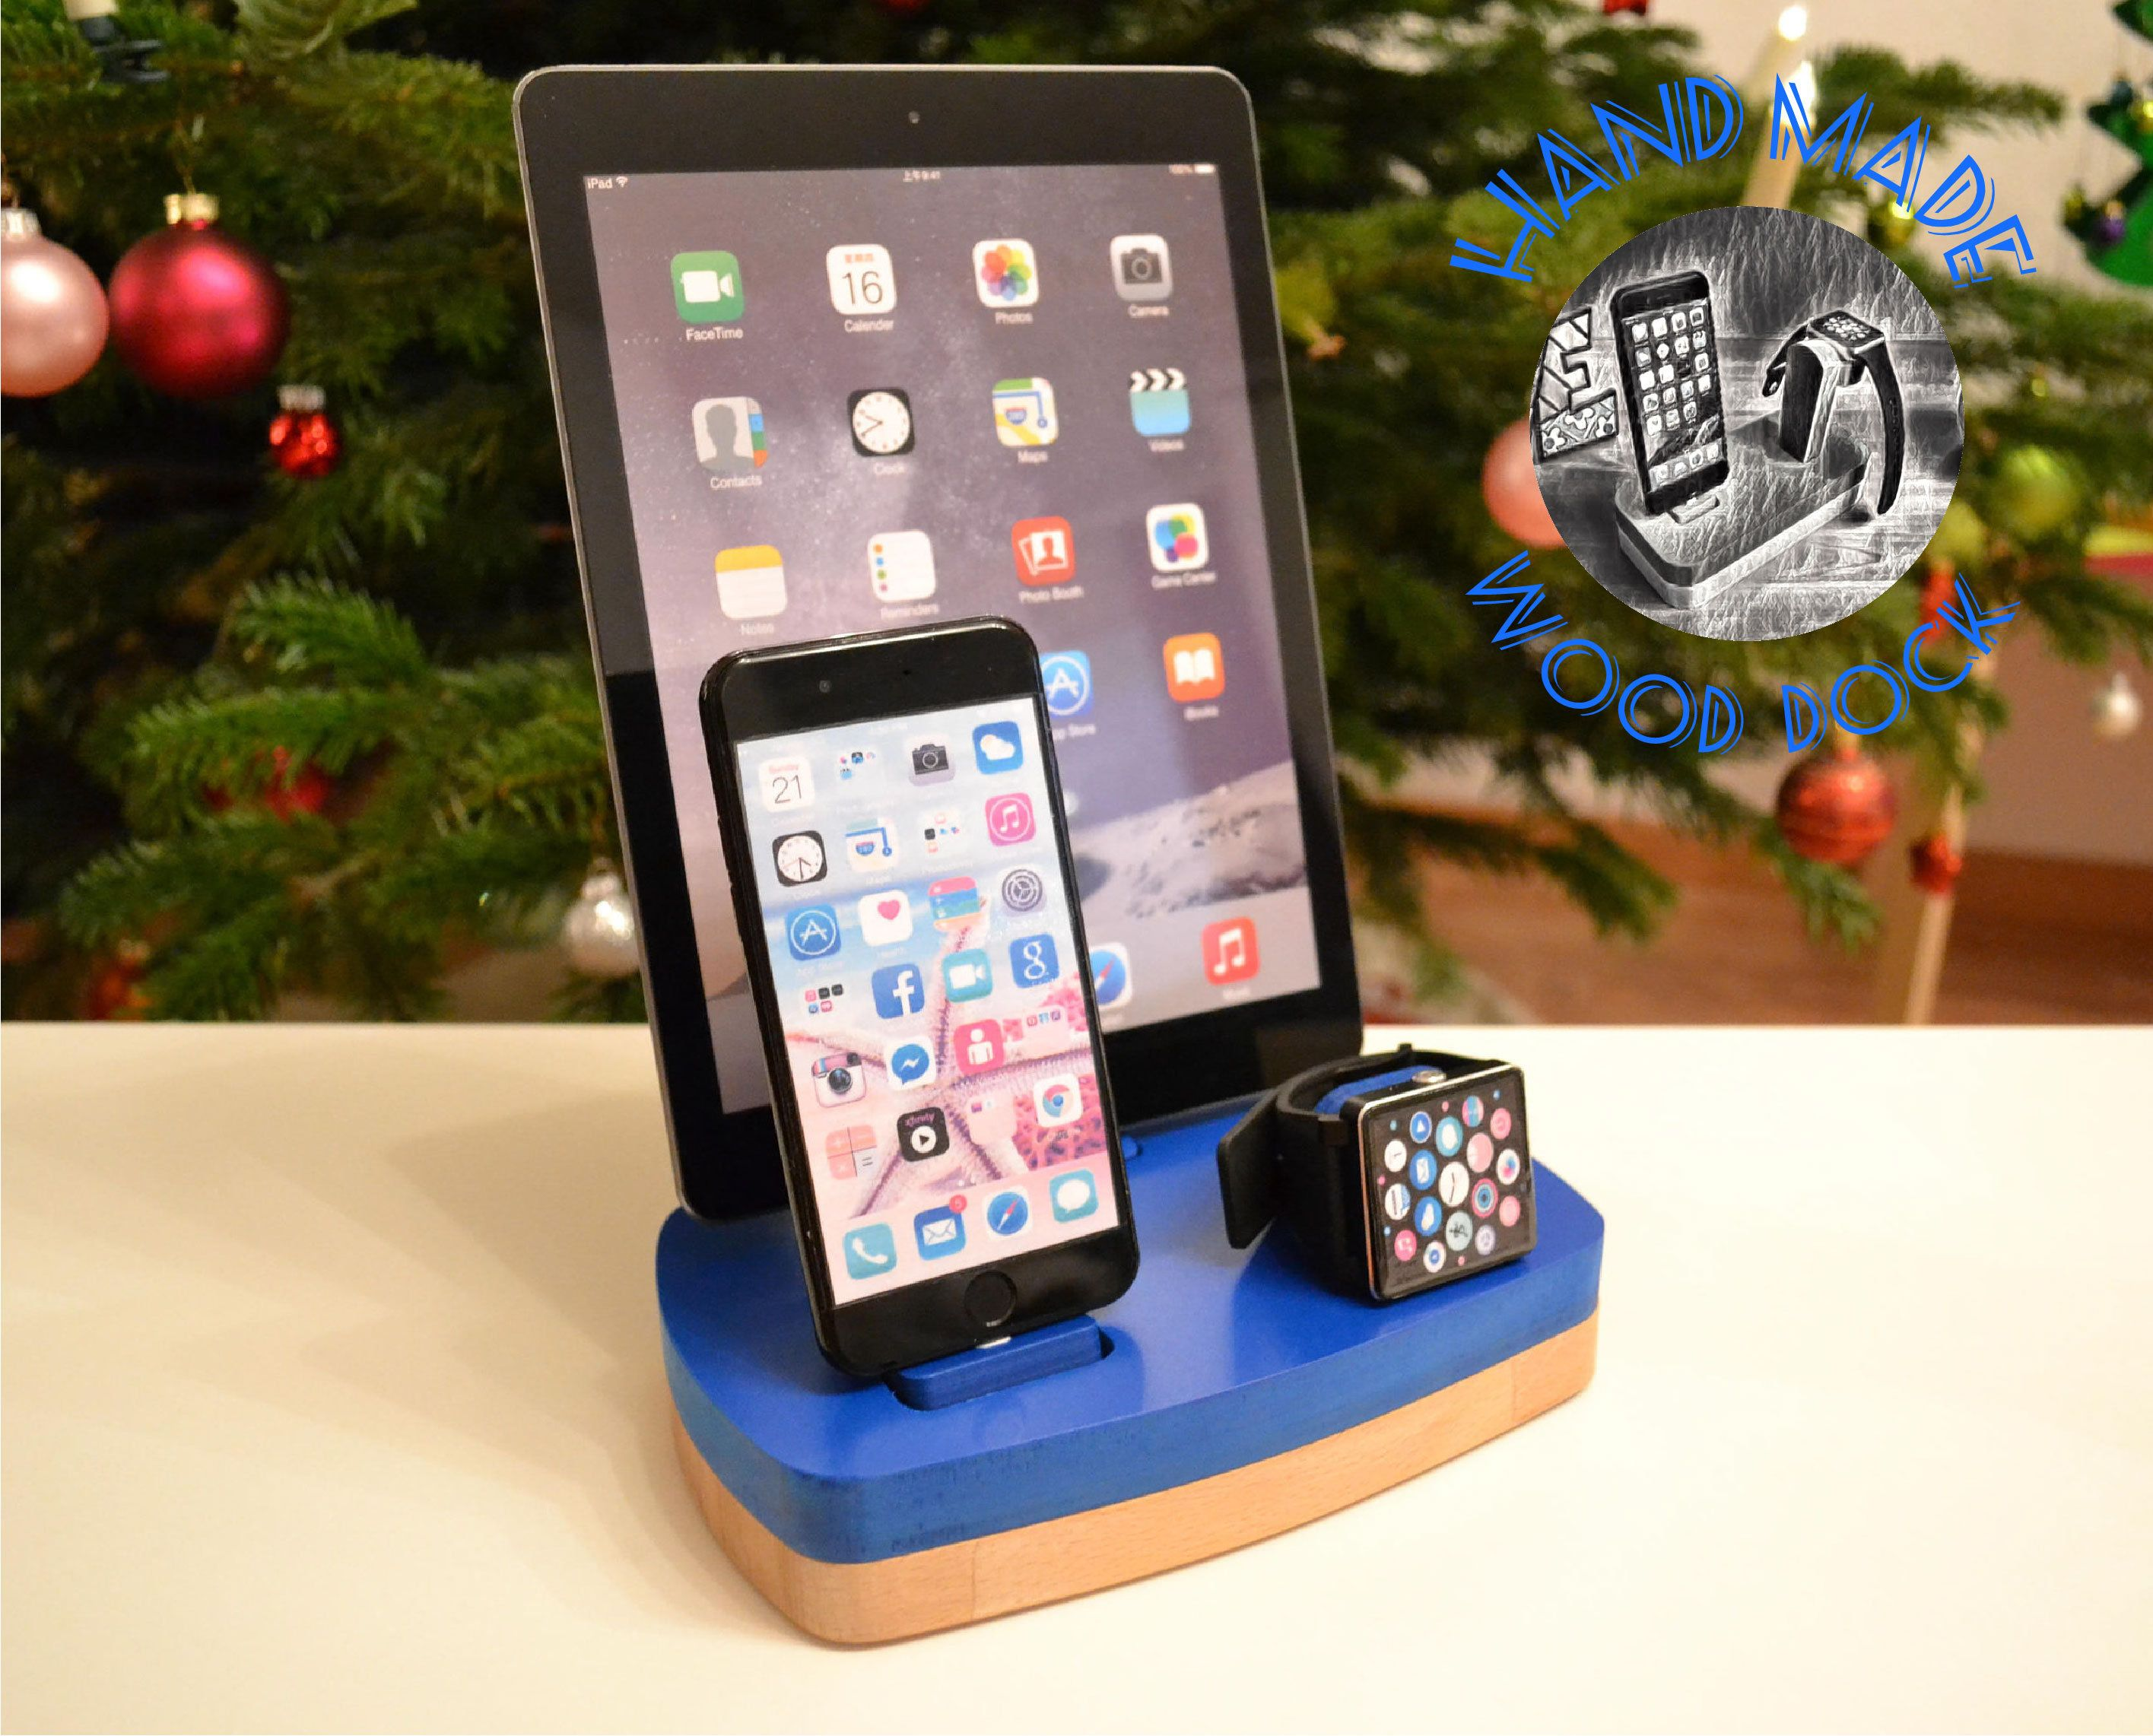 iDOQQ TRE apple watch stand iphone iPad watch docking station apple ...